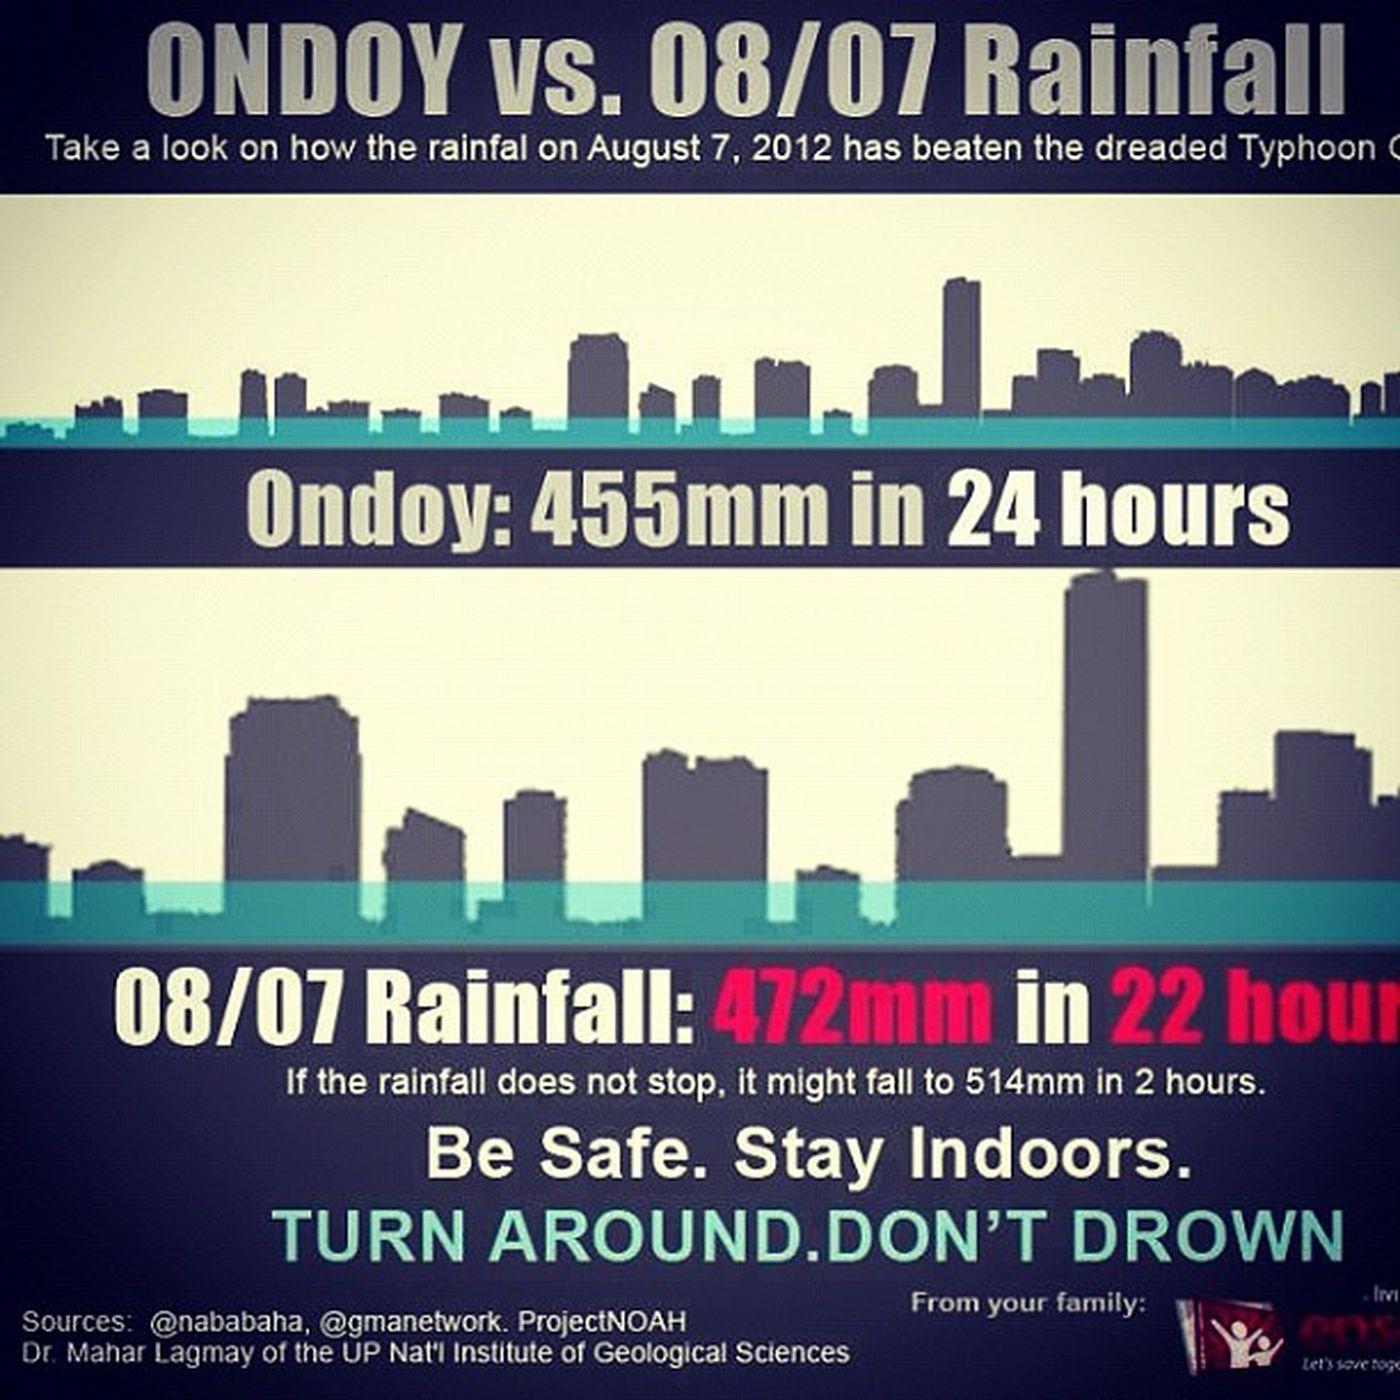 Typhoon Ondoy vs august Rainfall Disaster storm warning flooded flood pray philippines pilipinas manila ig igers igdaily igersmanila